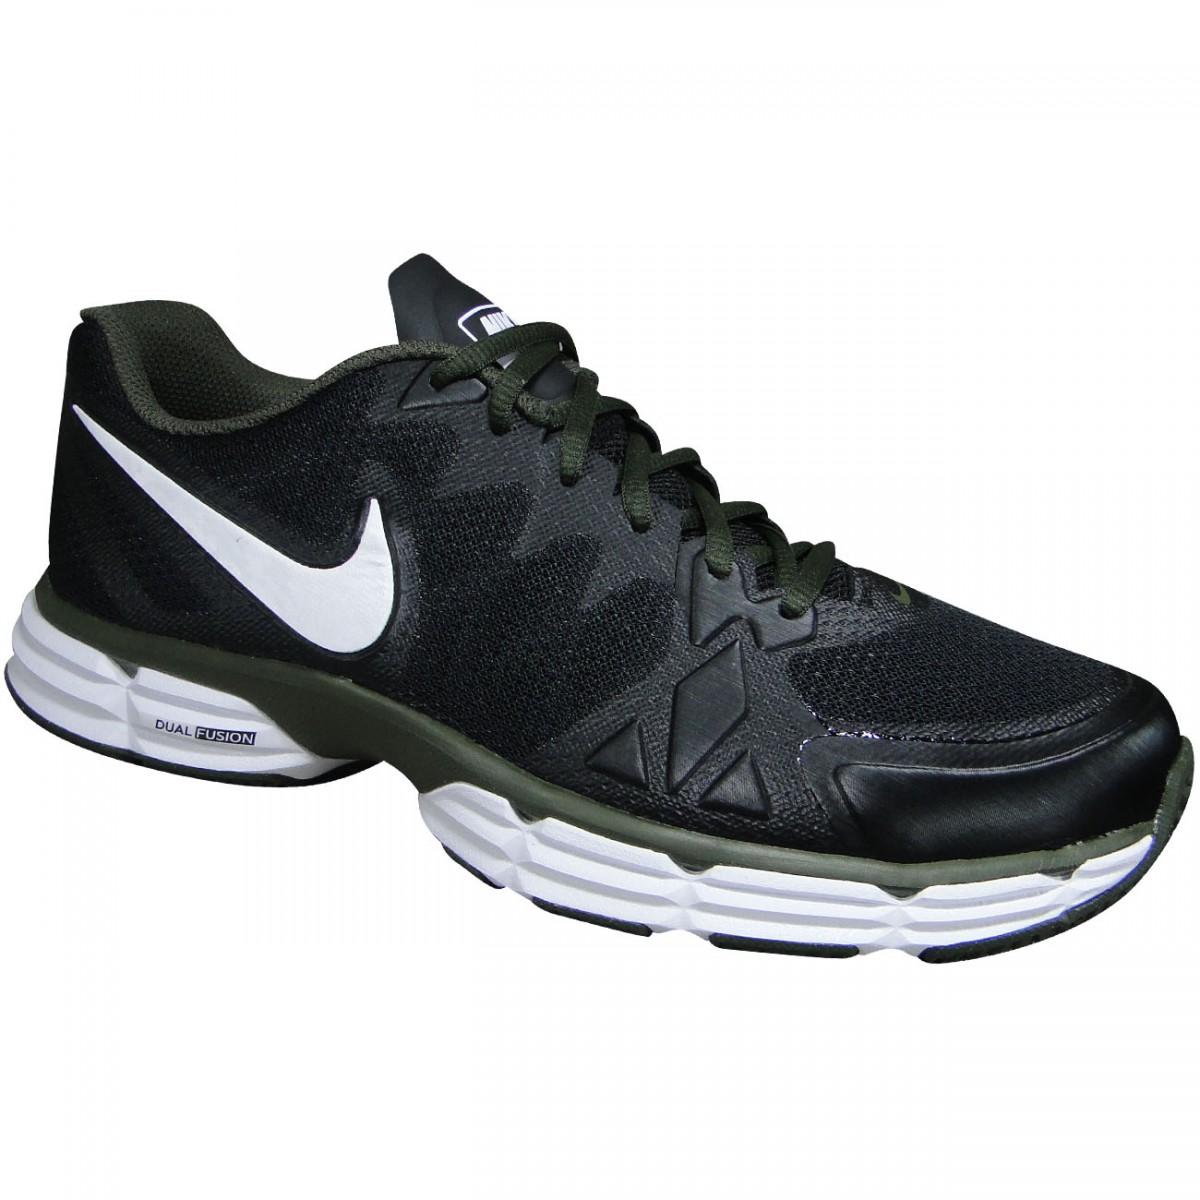 4e704a38c Tenis Nike Dual Fusion Tr 6.